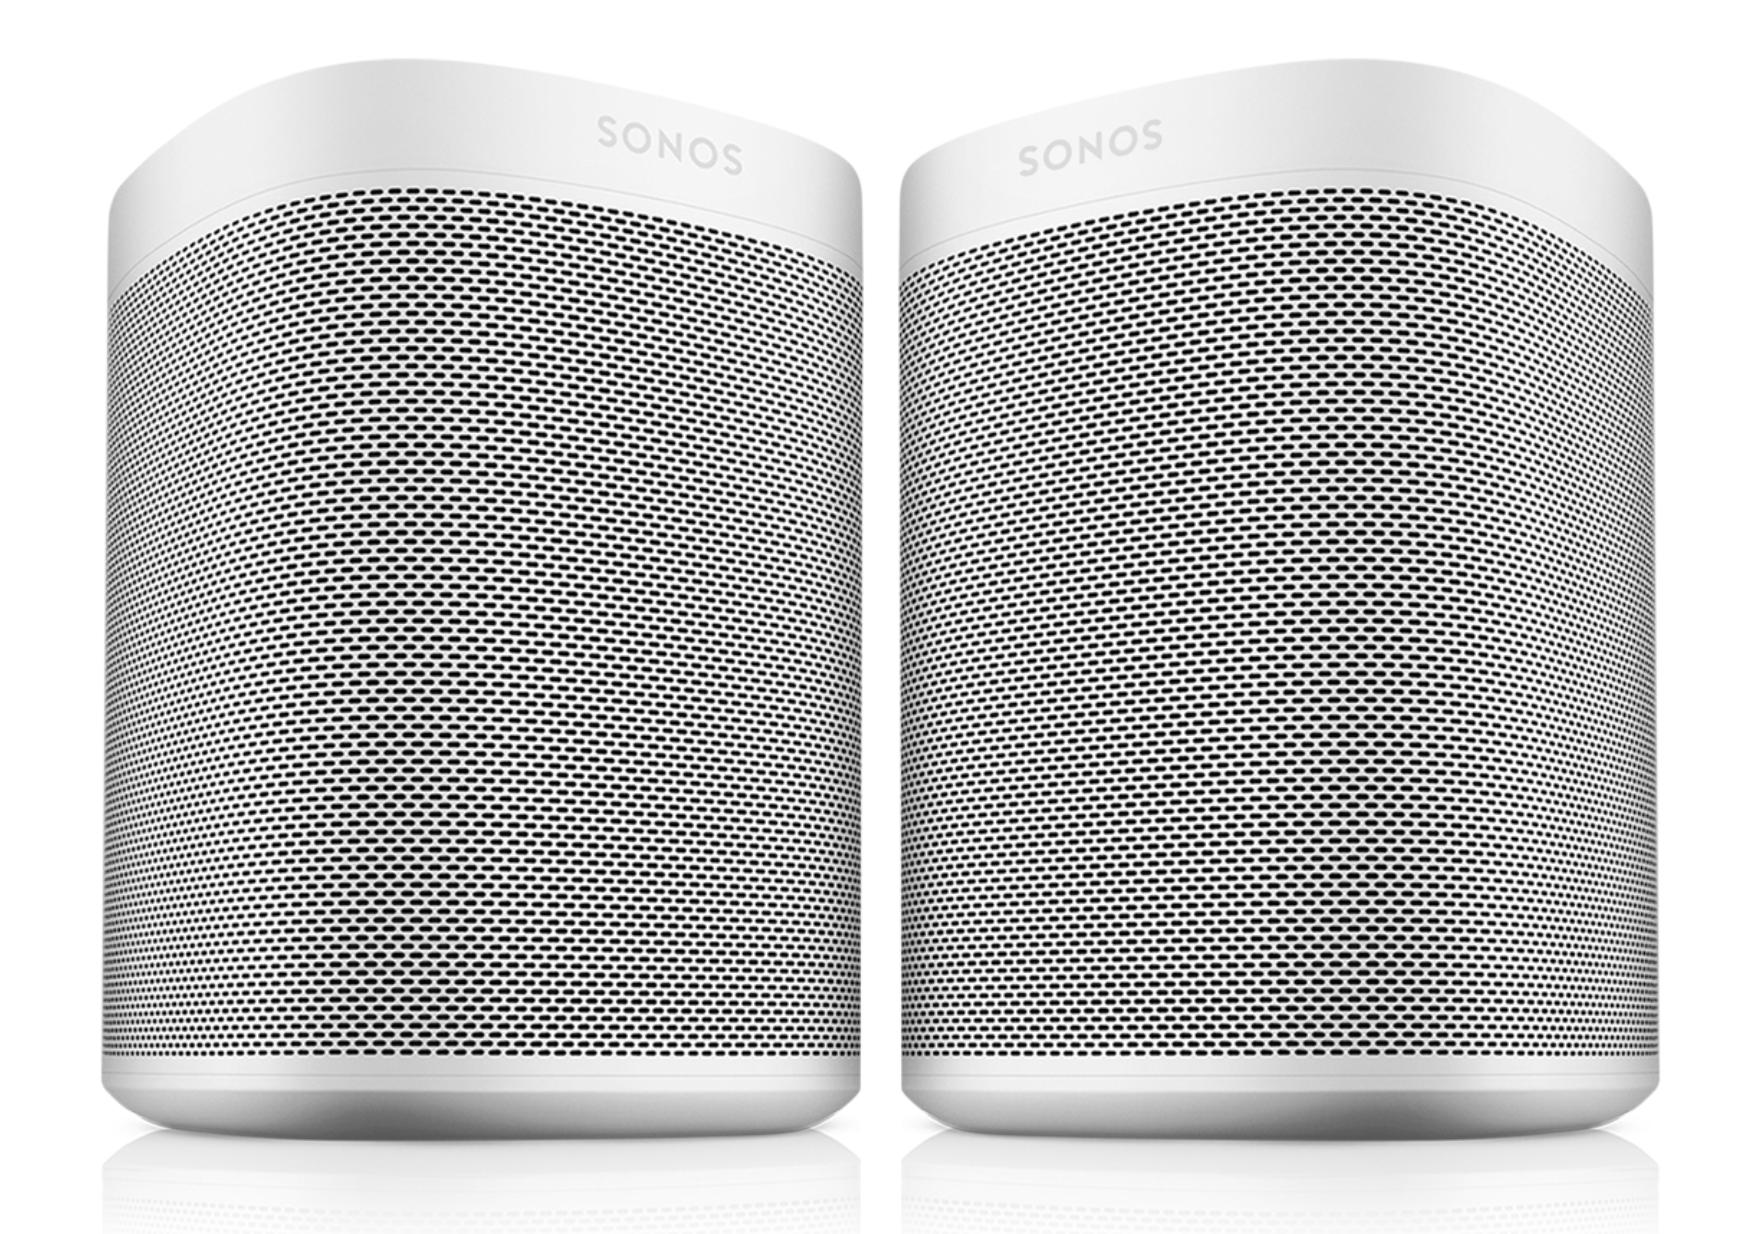 Sonos троллит HomePod